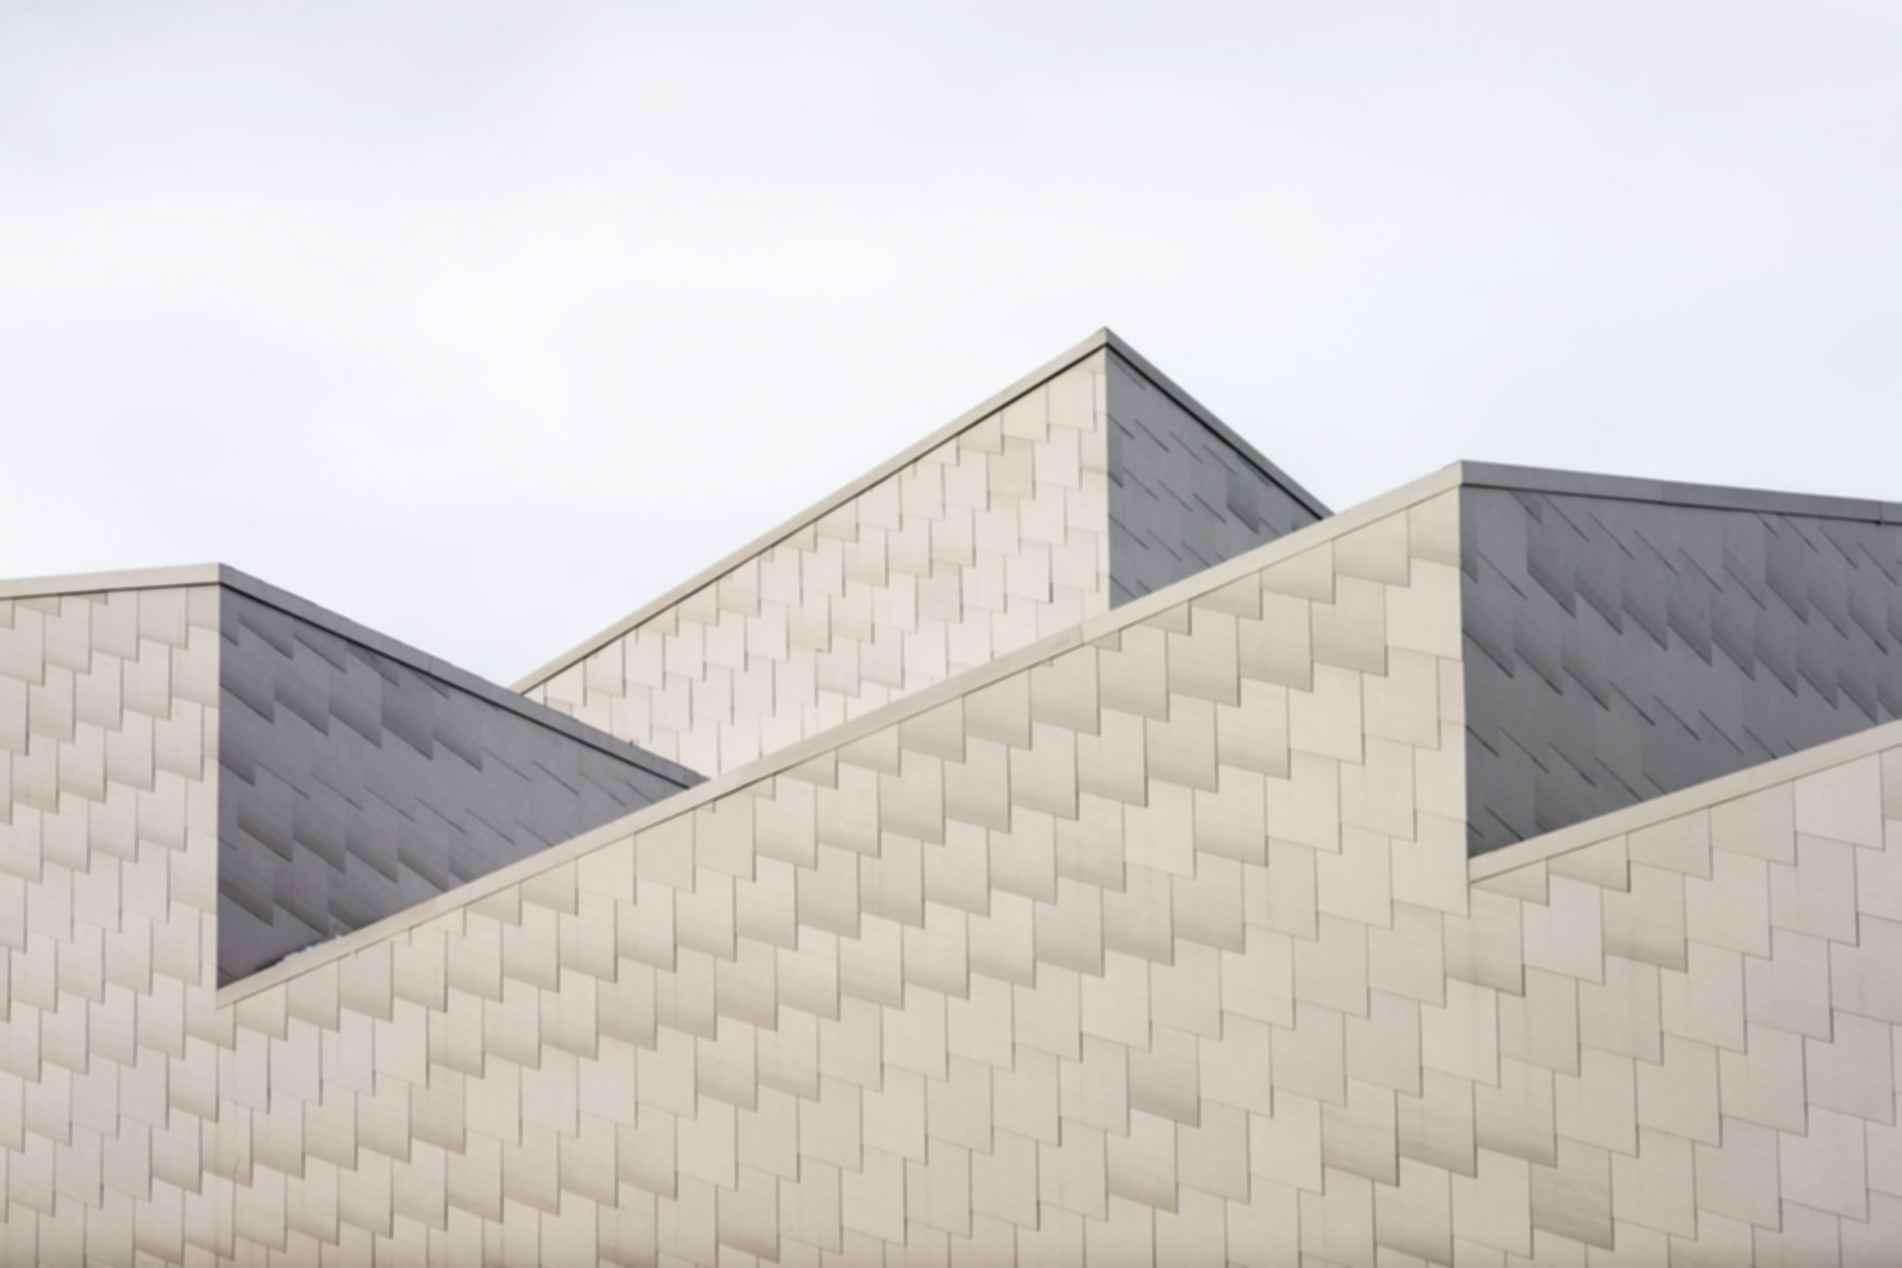 Porsgrunn Maritime Museum - Roof Detail